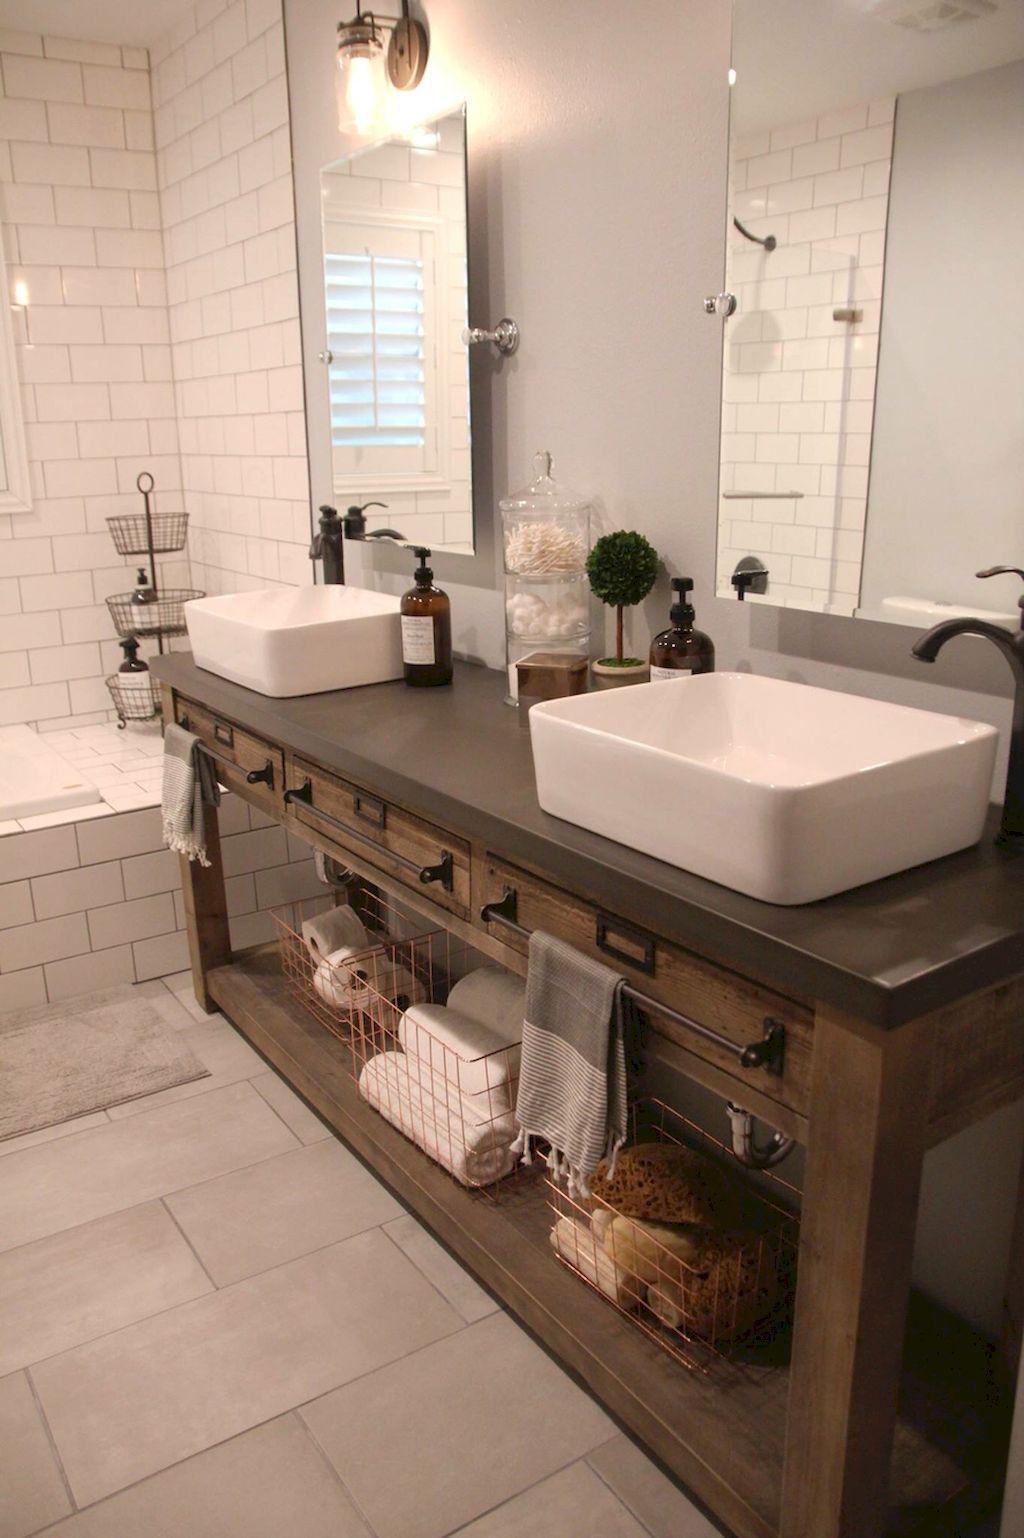 12 Clever Concepts Of How To Improve Rustic Bathroom Sink Ideas Diy Bathroom Remodel Small Bathroom Sinks Bathroom Vanity Designs [ 1538 x 1024 Pixel ]